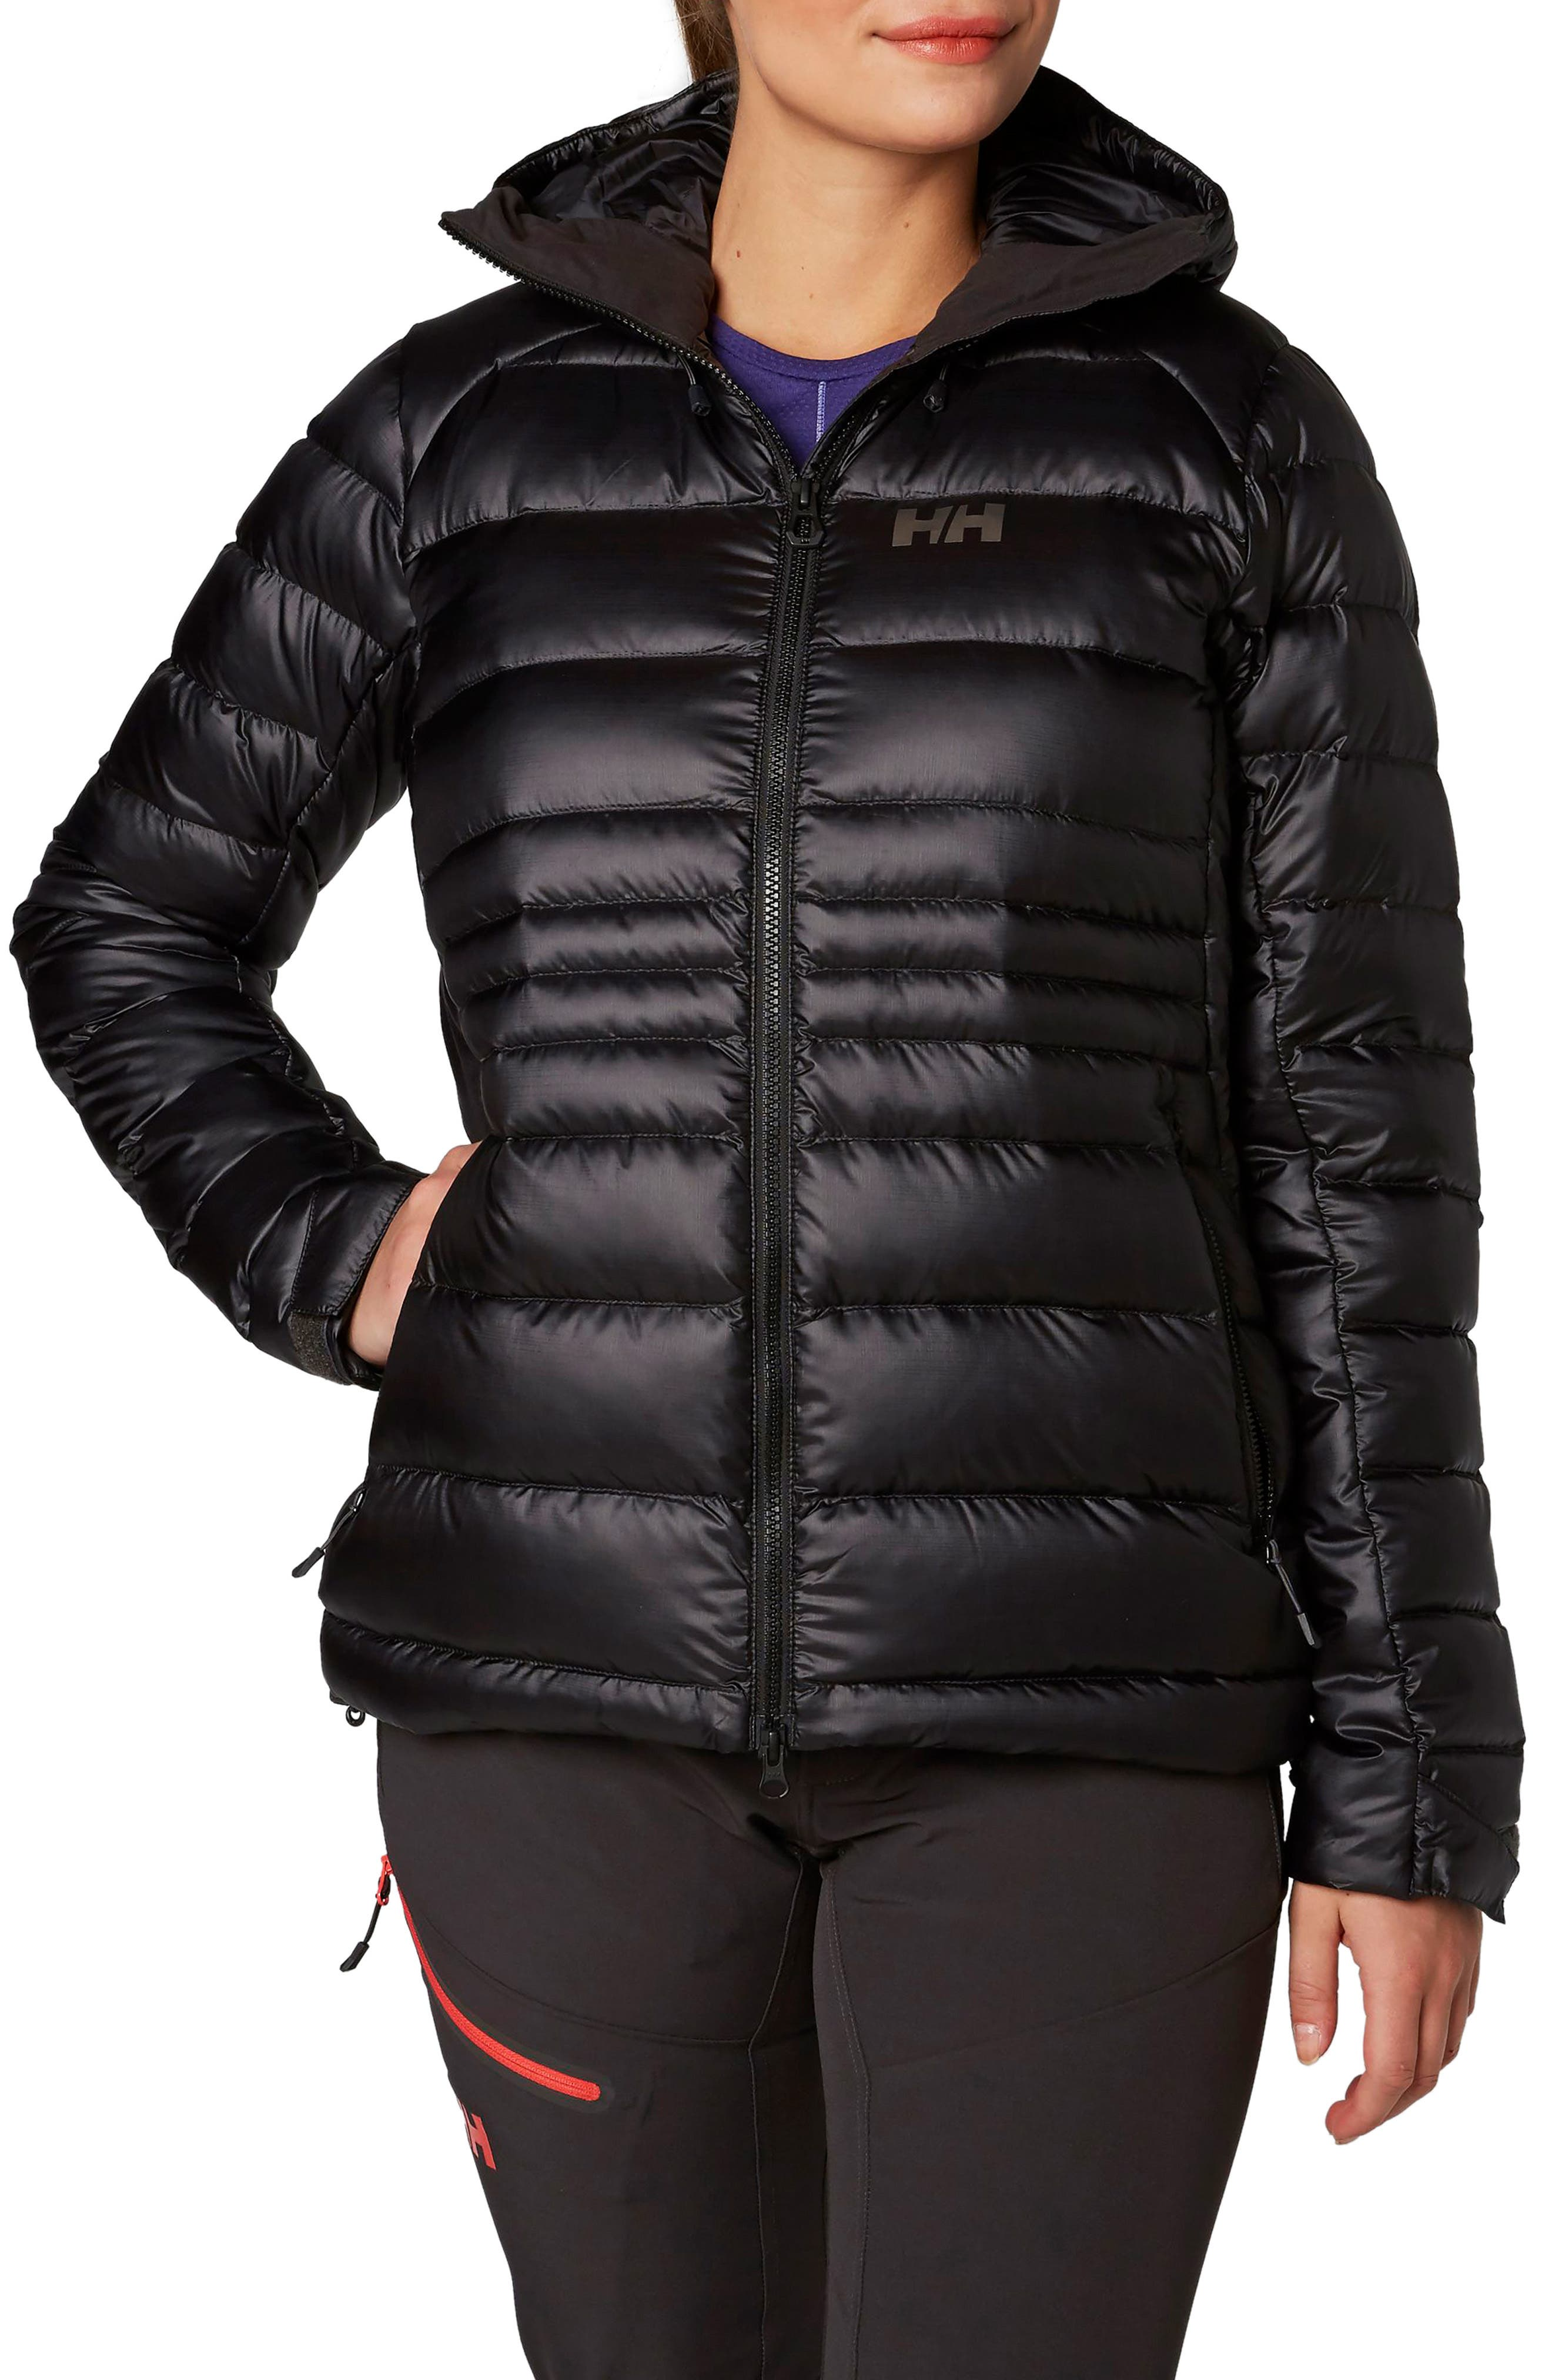 Vanir Icefall Down Jacket,                             Main thumbnail 1, color,                             Black